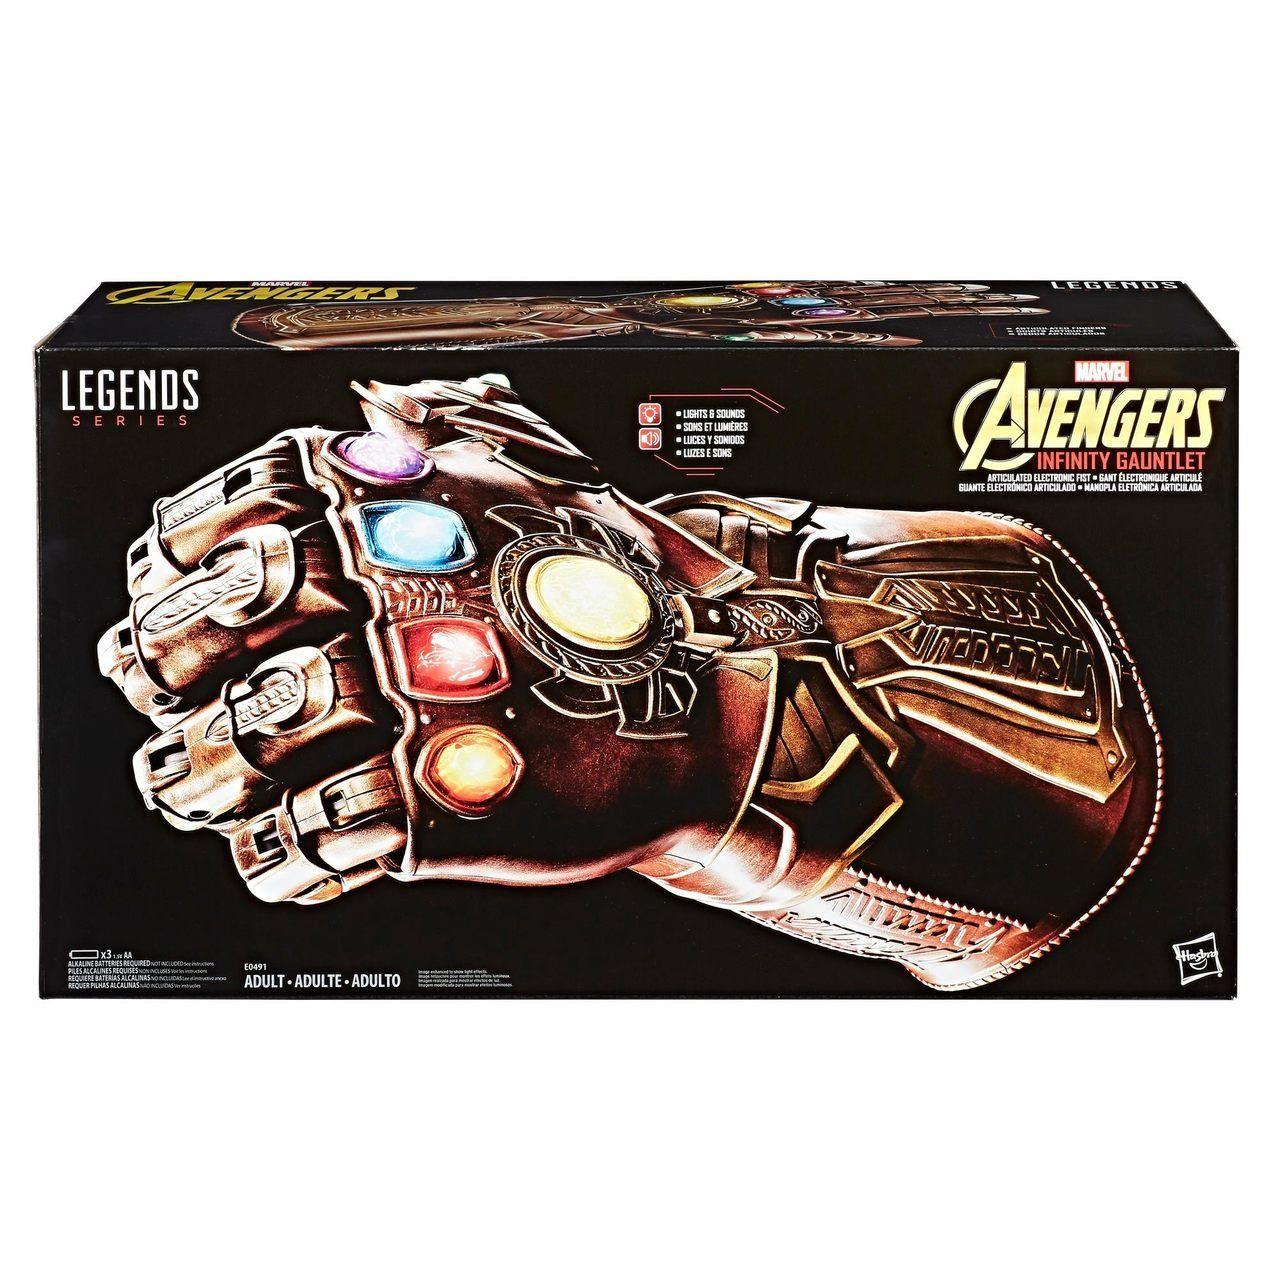 Réplica Manopla do Infinito - Thanos (Infinity Gauntlet): Vingadores Guerra Infinita (Avengers Infinity War) - Marvel Legends